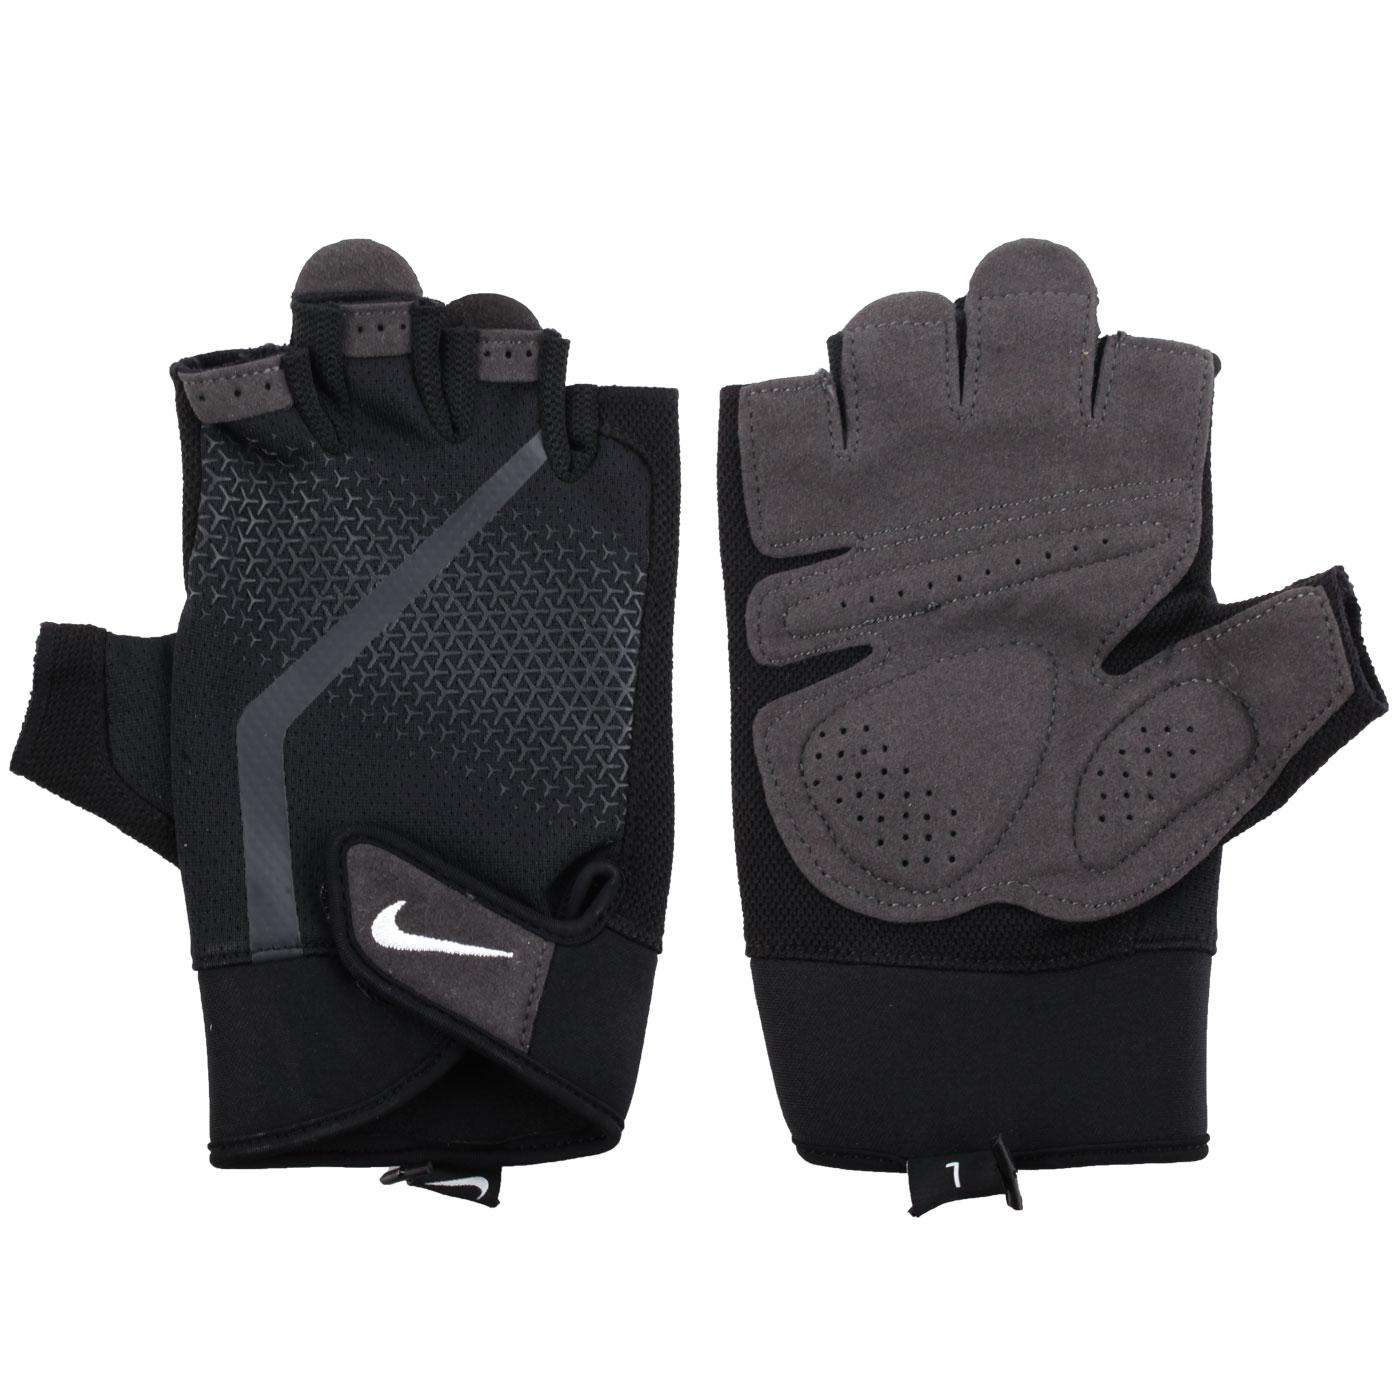 NIKE 男款健力手套 NLGC4945MD - 黑灰白